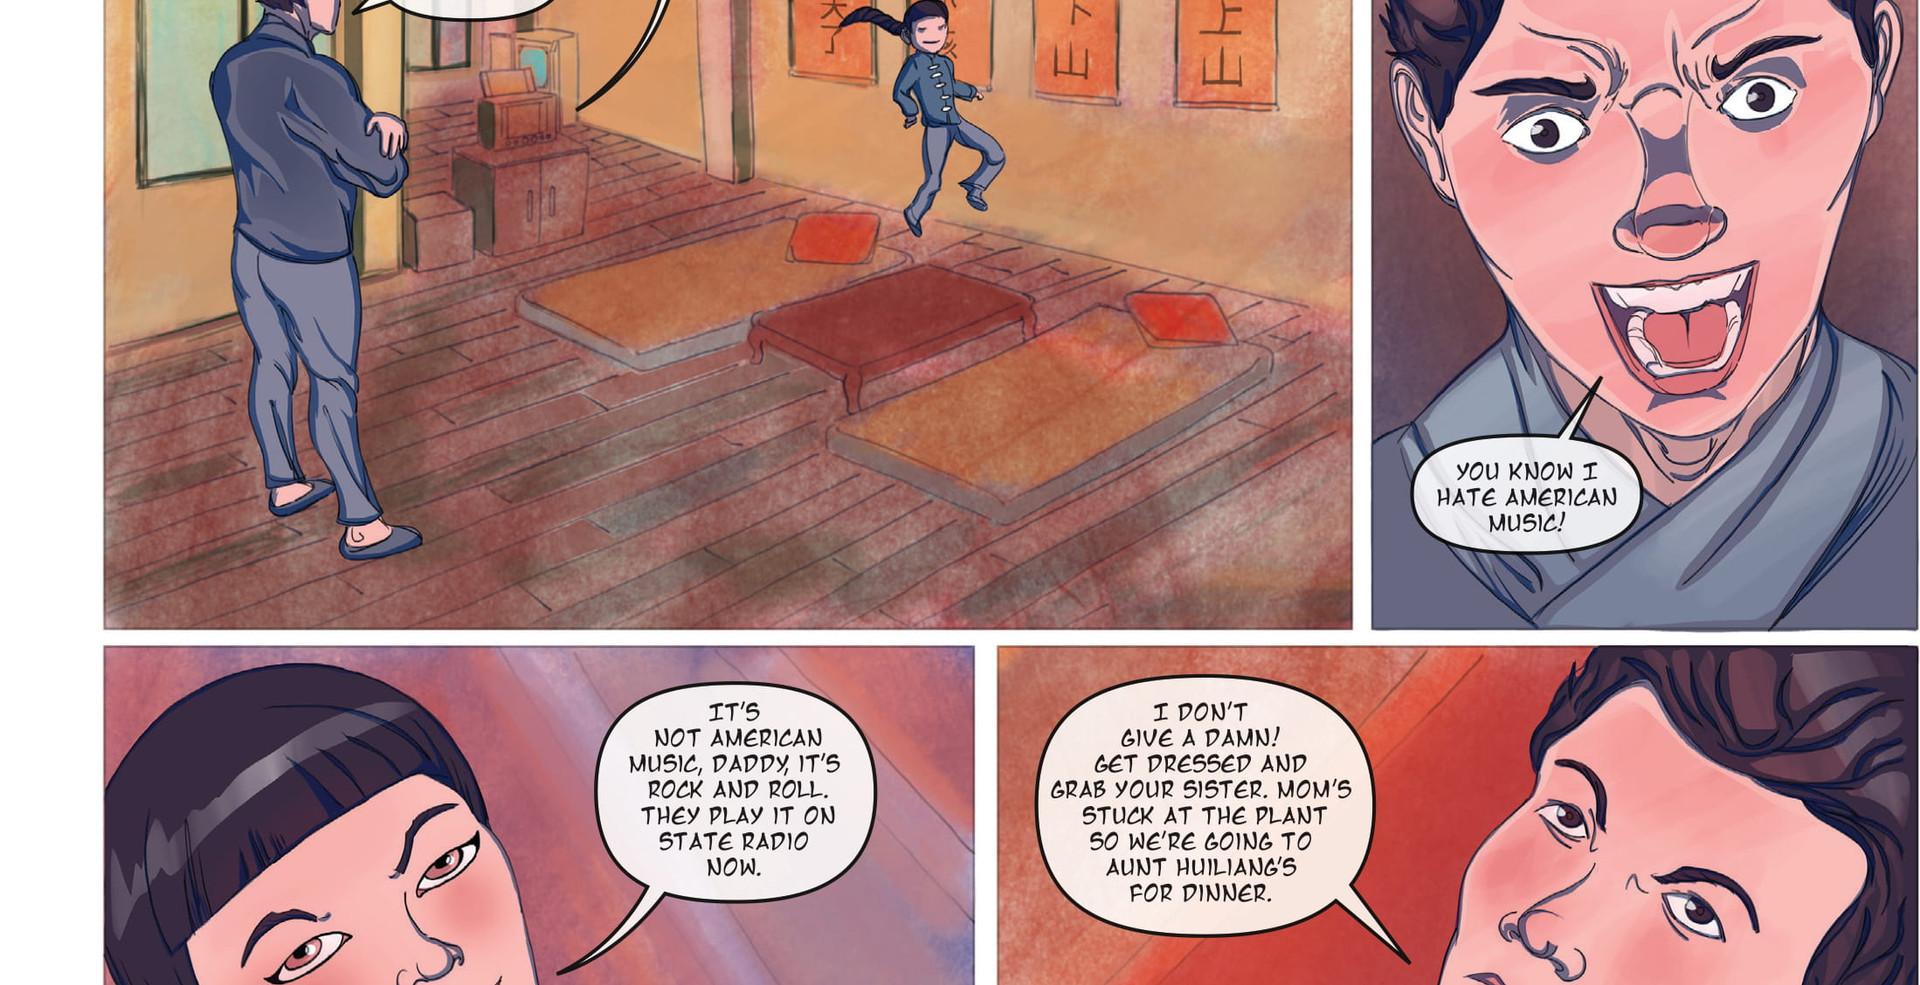 Cassandra comic (1) (1) (1)-02.jpg